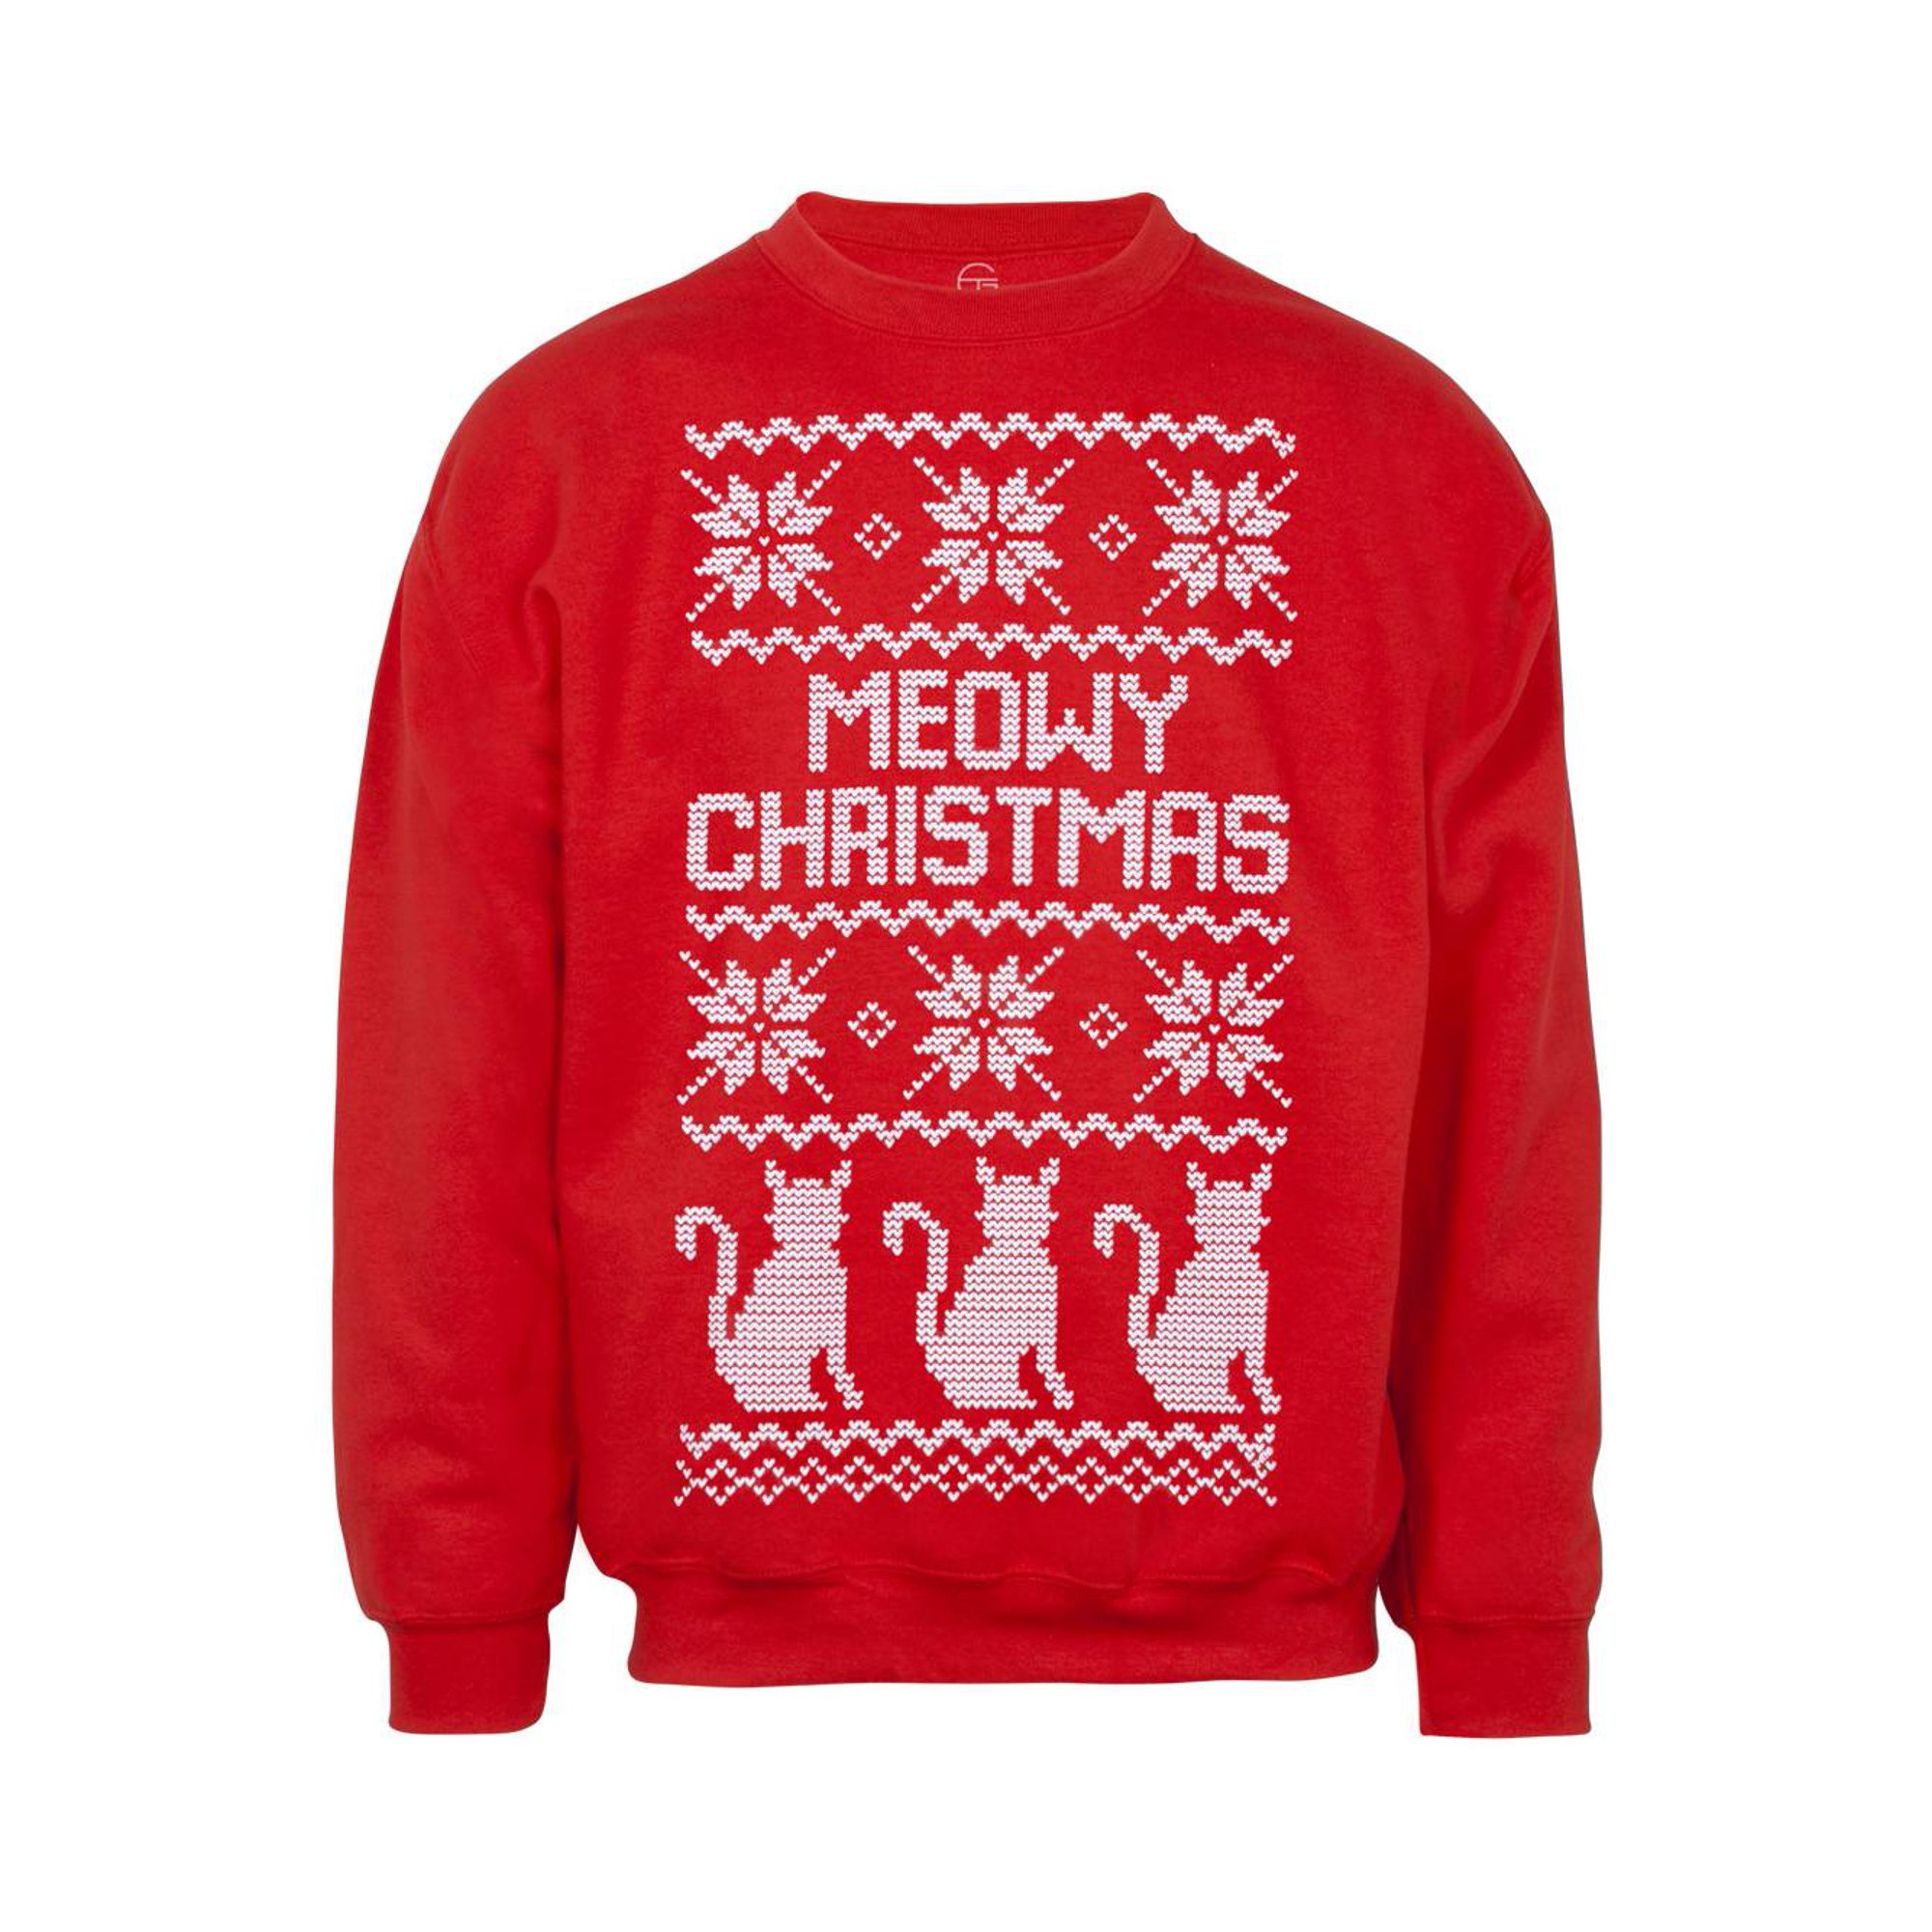 3x Ugly Christmas Sweater.Mens Meow Christmas Cat Ugly Christmas Sweatshirt 3x Large